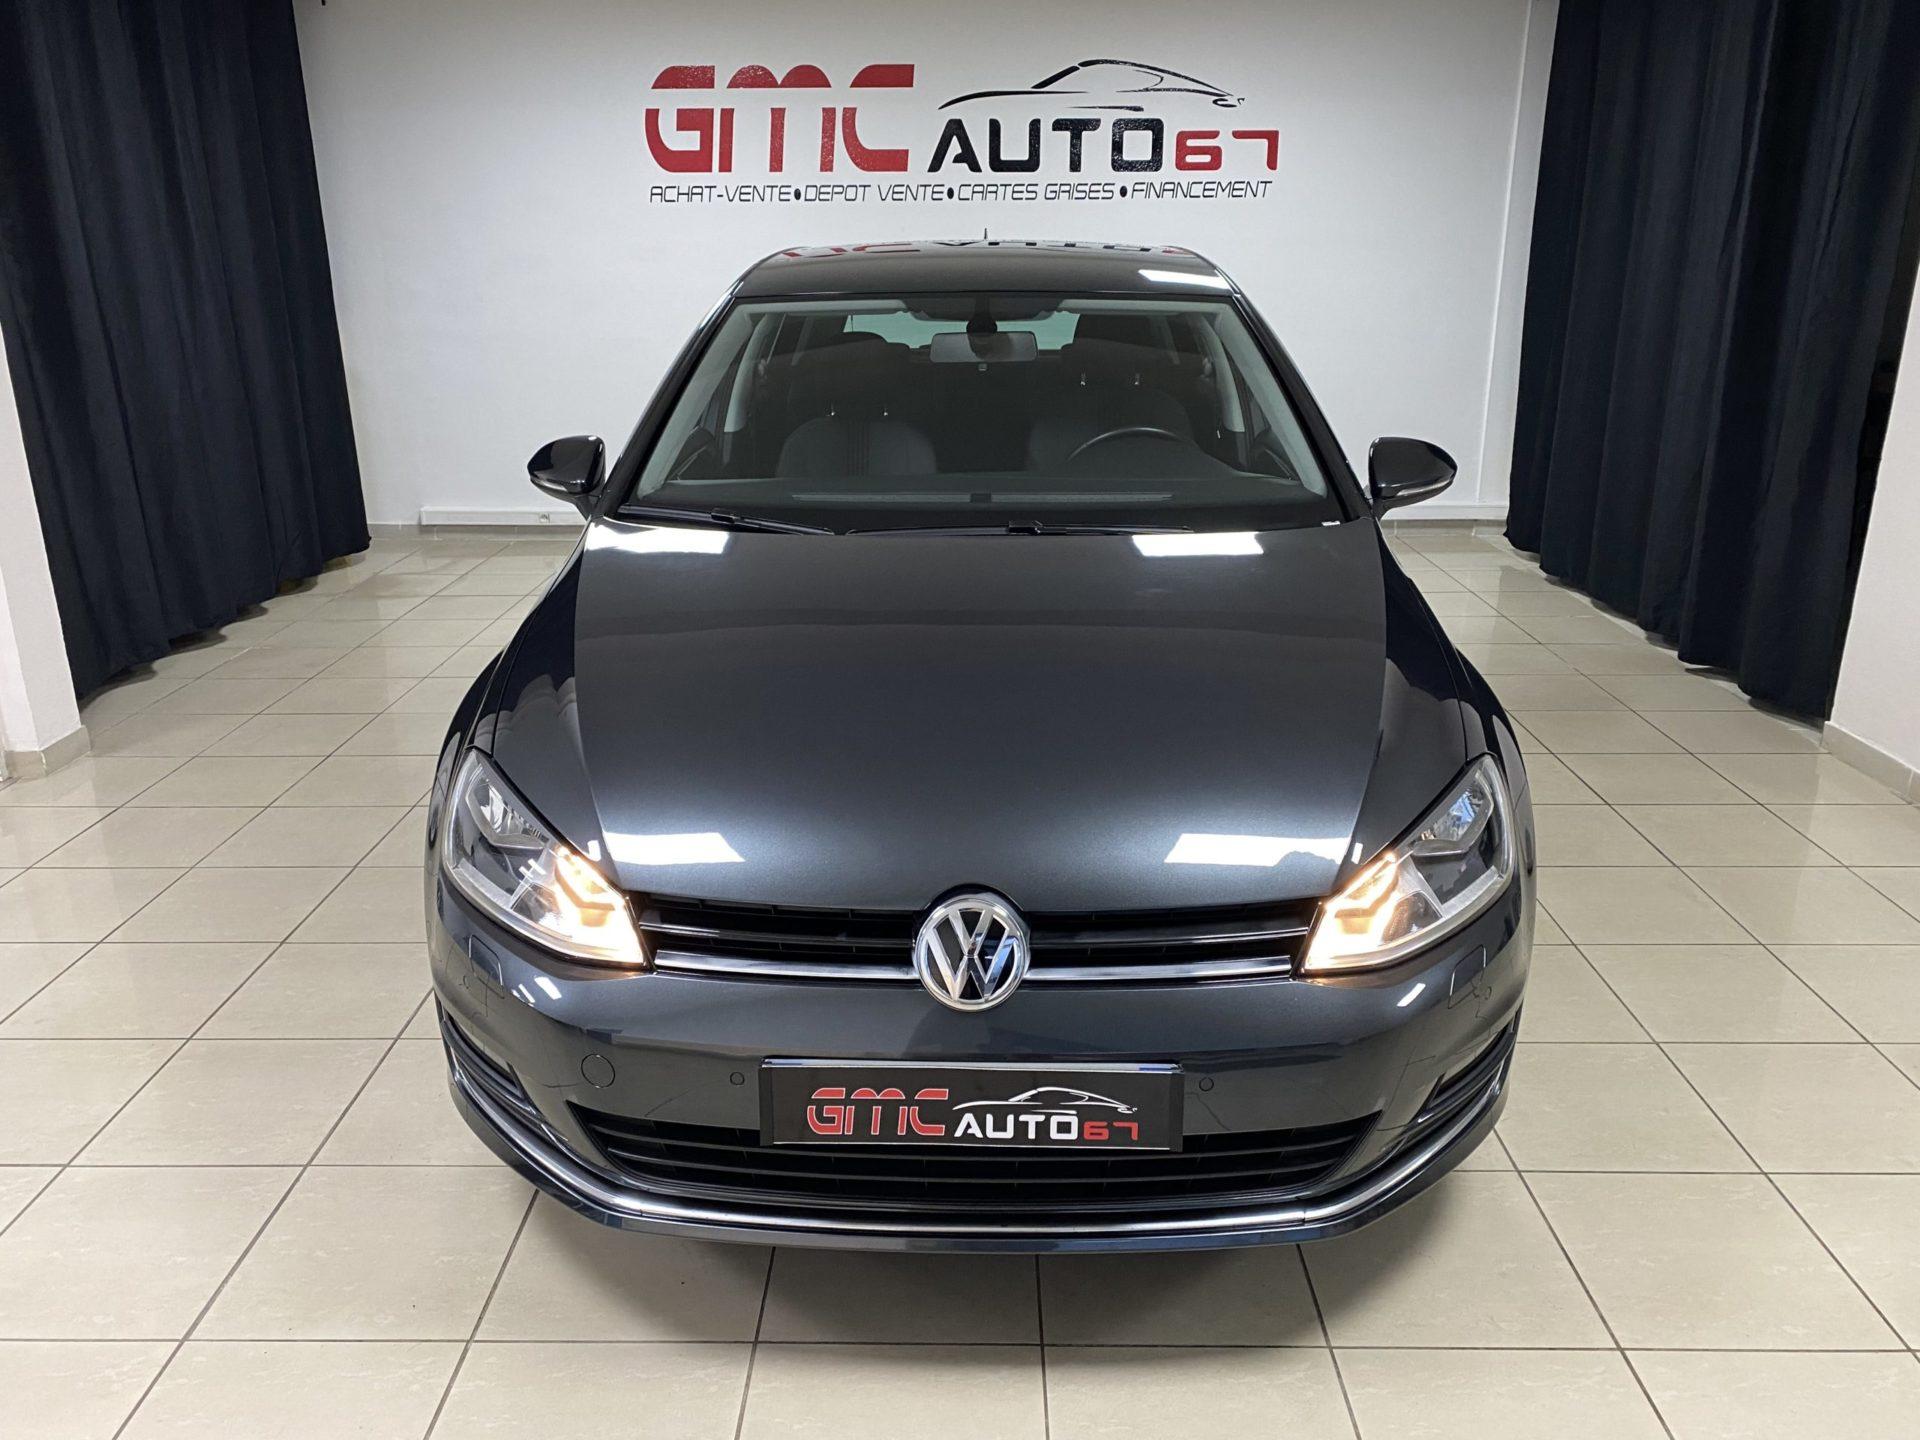 Volkswagen Golf 1.4 TSI 125 BlueMotion Technology Allstar - GMC AUTO 67